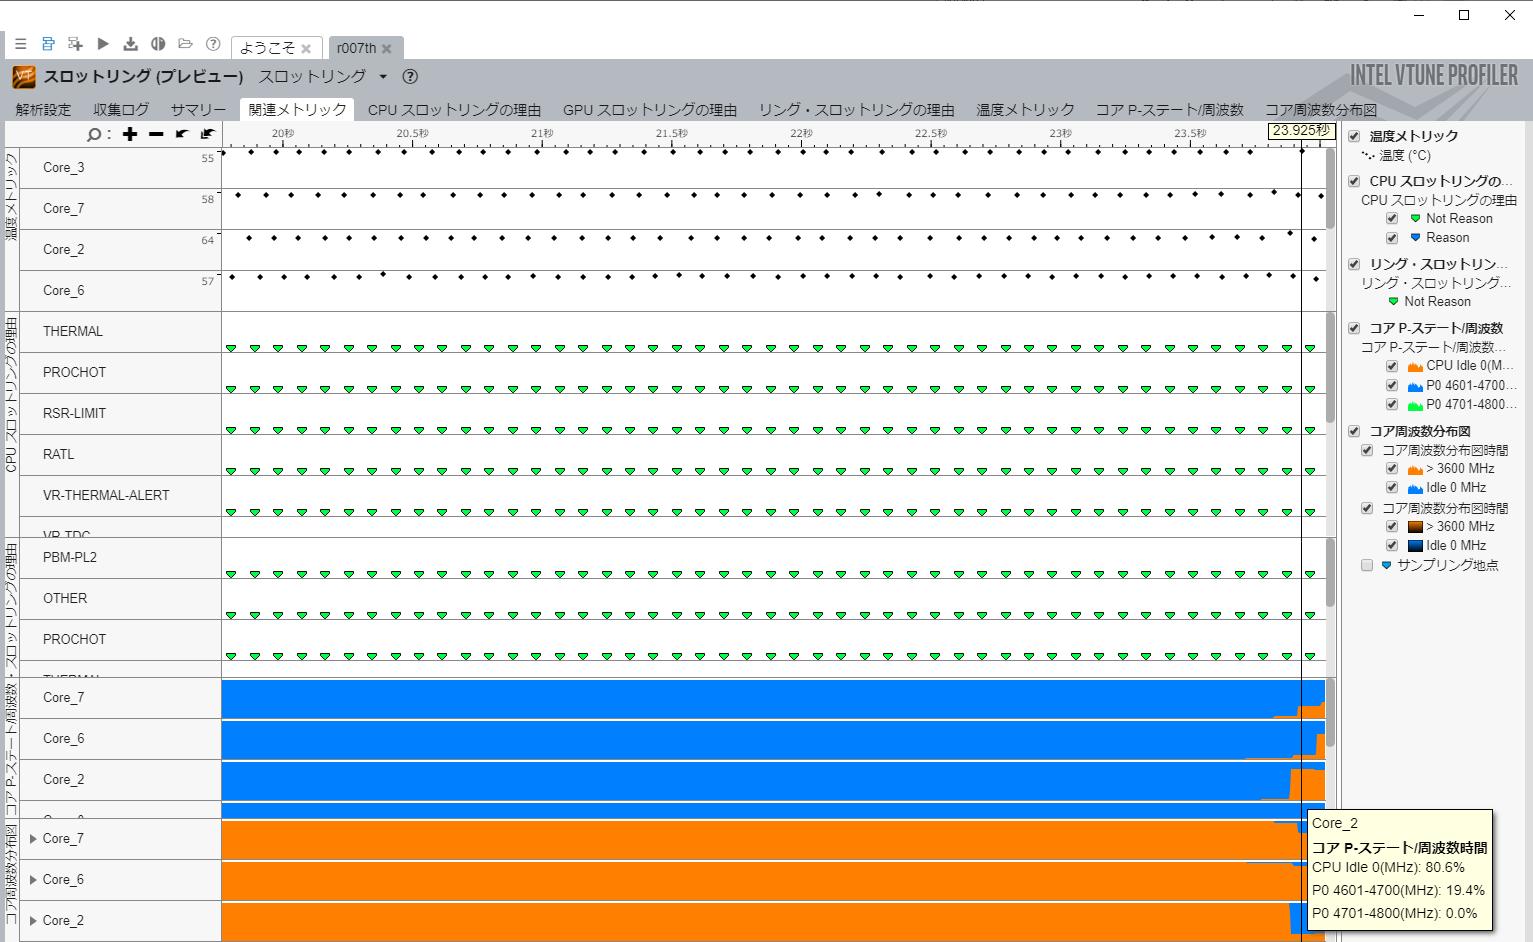 Correlated Metrics from Throttling Analysis